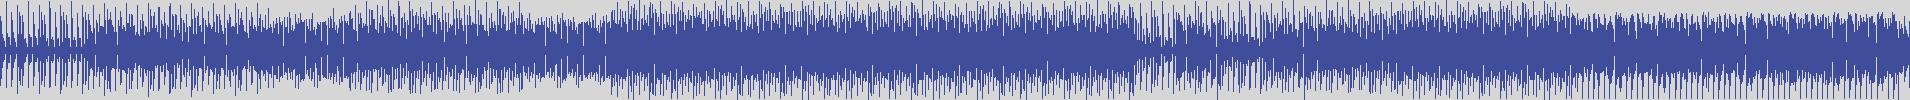 worldwide_music_records [WMR004] Fundamental Lounge Union - Money Back [Original Mix] audio wave form